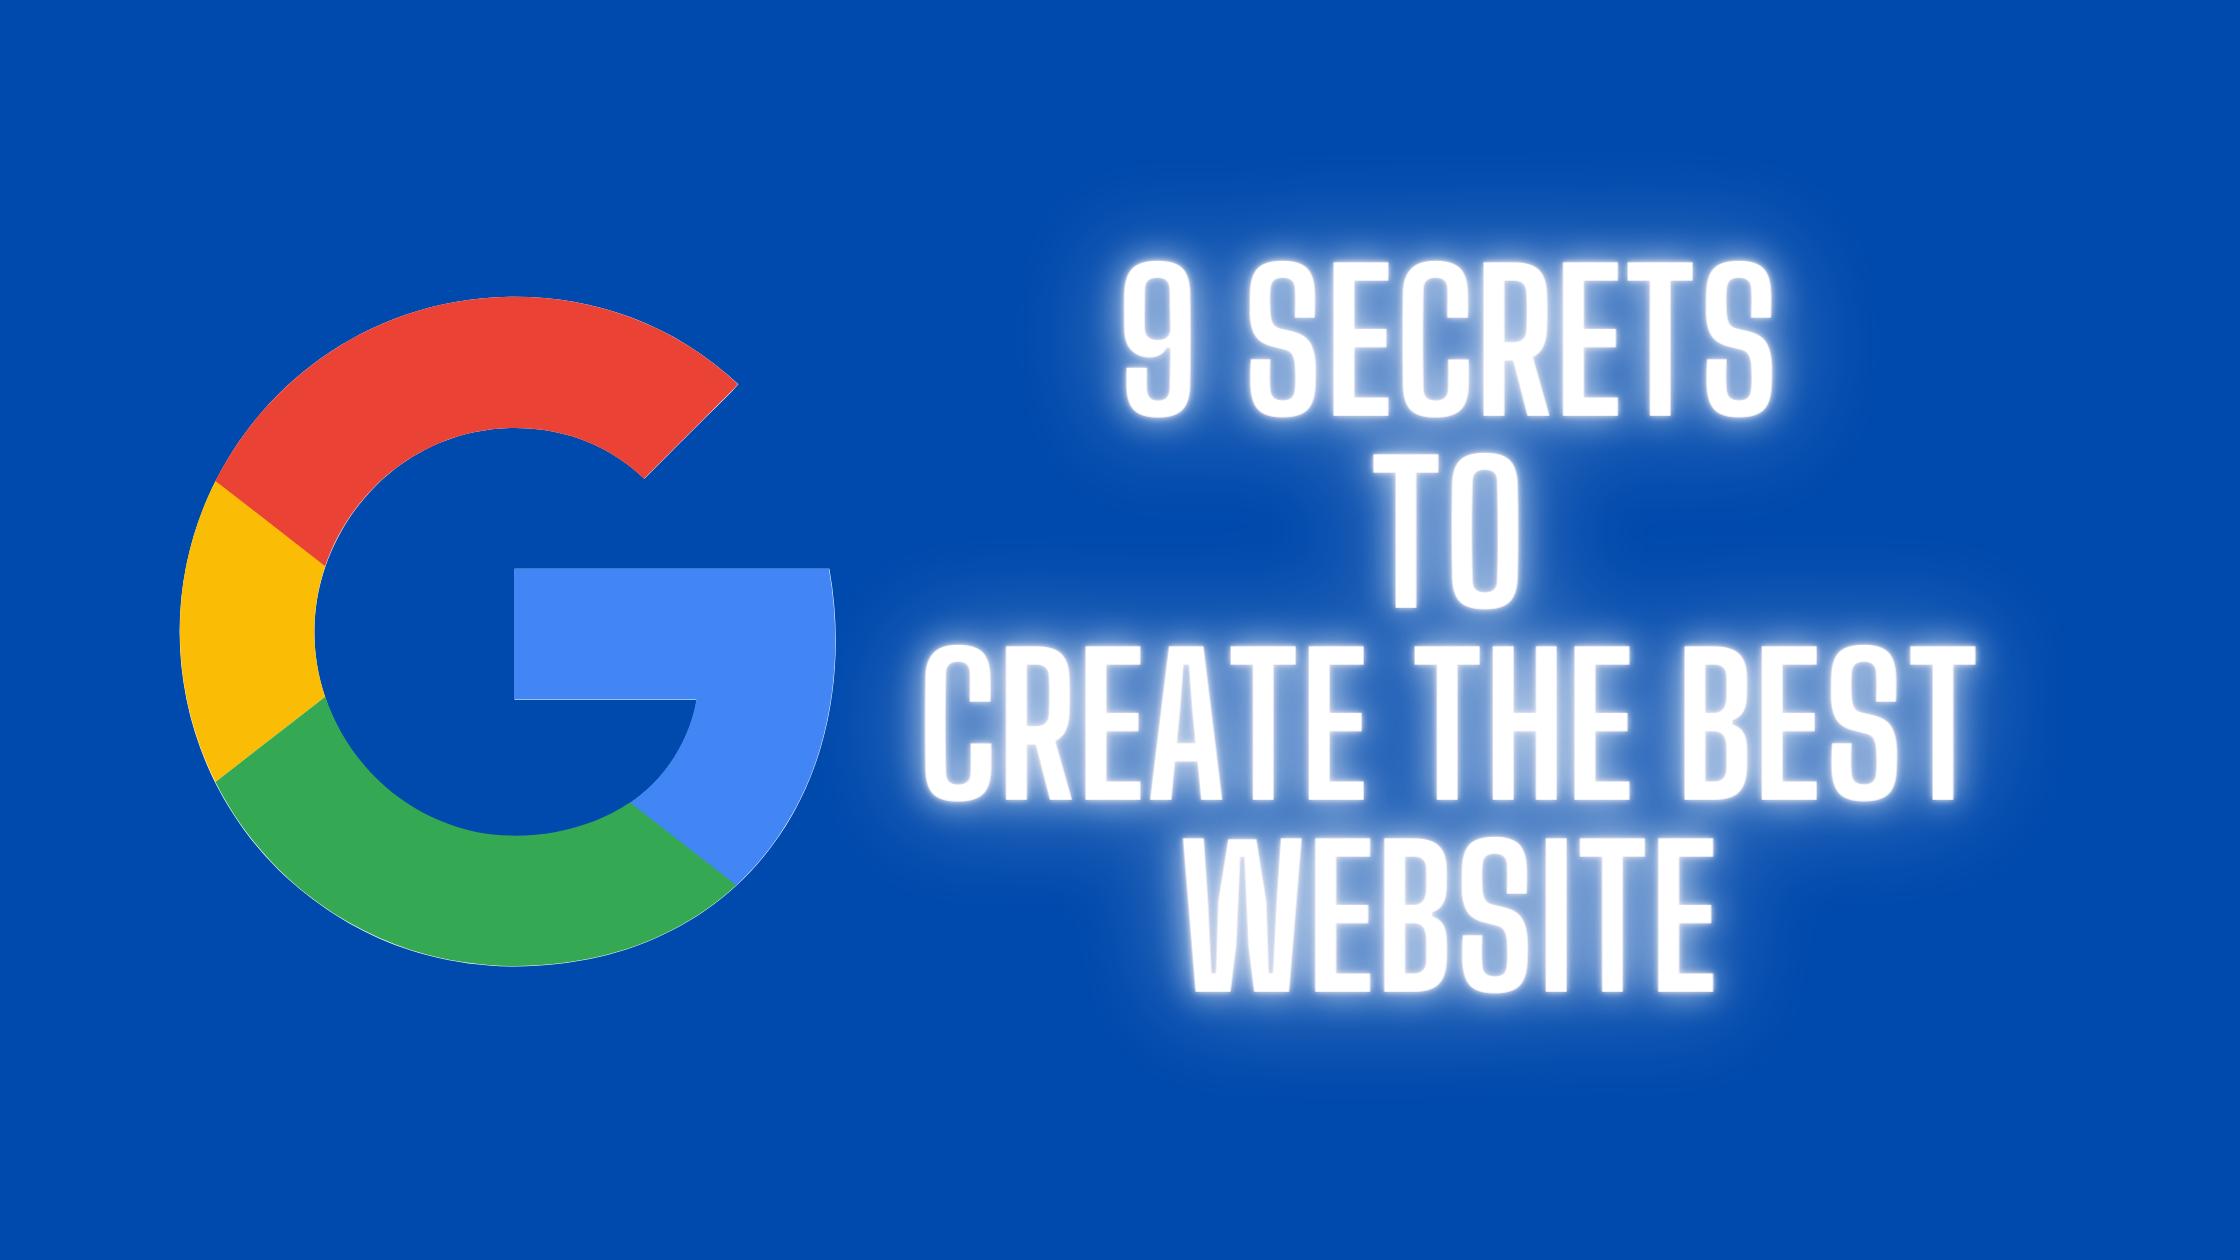 SECRETS-TO-CREATE-THE-BEST-WEBSITE